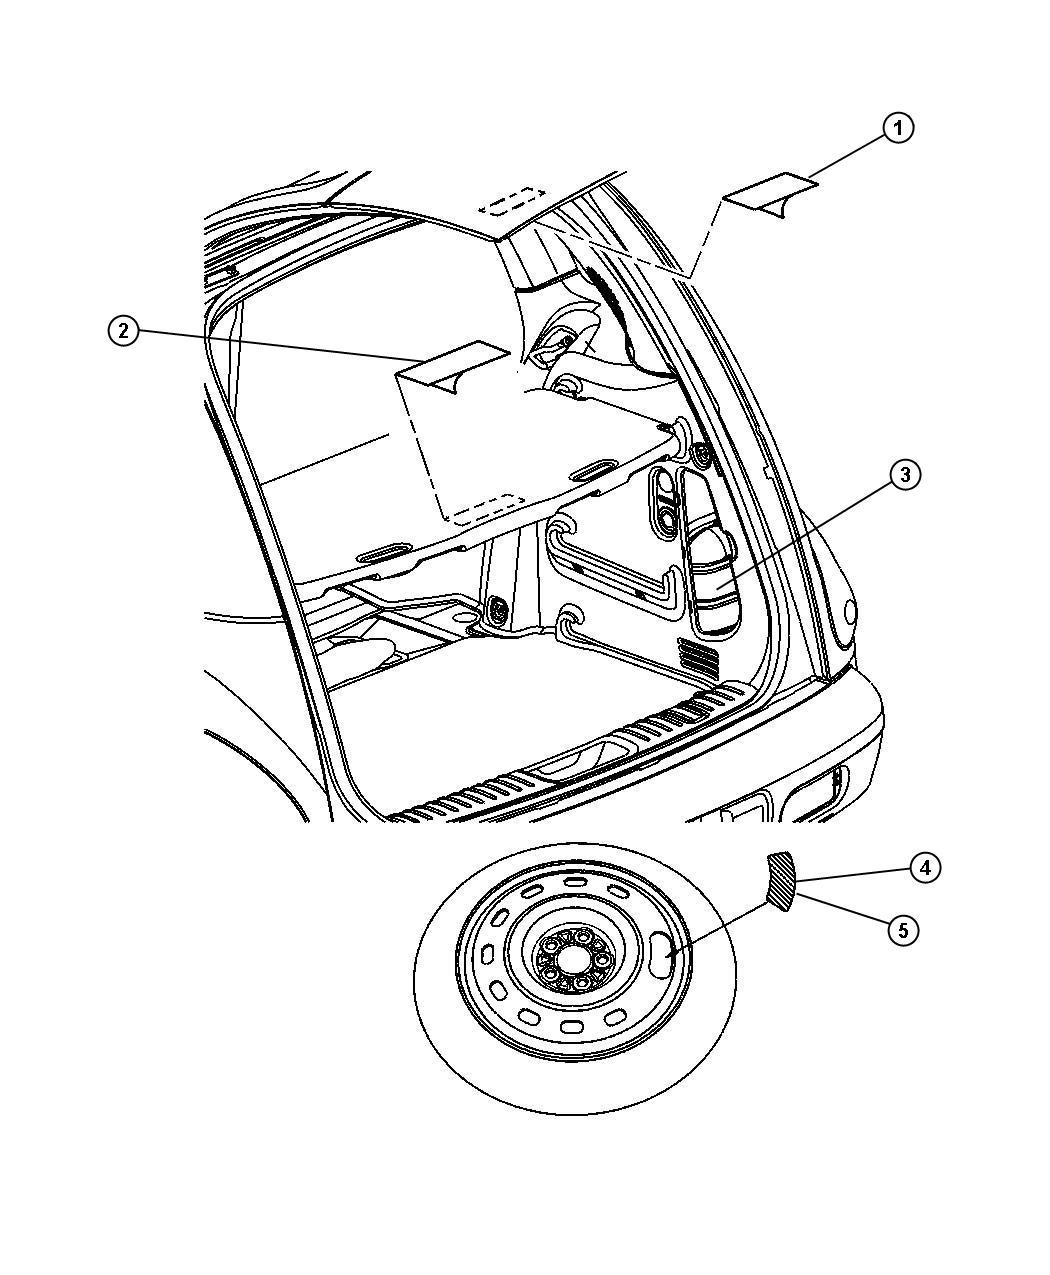 1997 Dodge Grand Caravan SE LWB 3.3L V6 Label. Exhaust gas